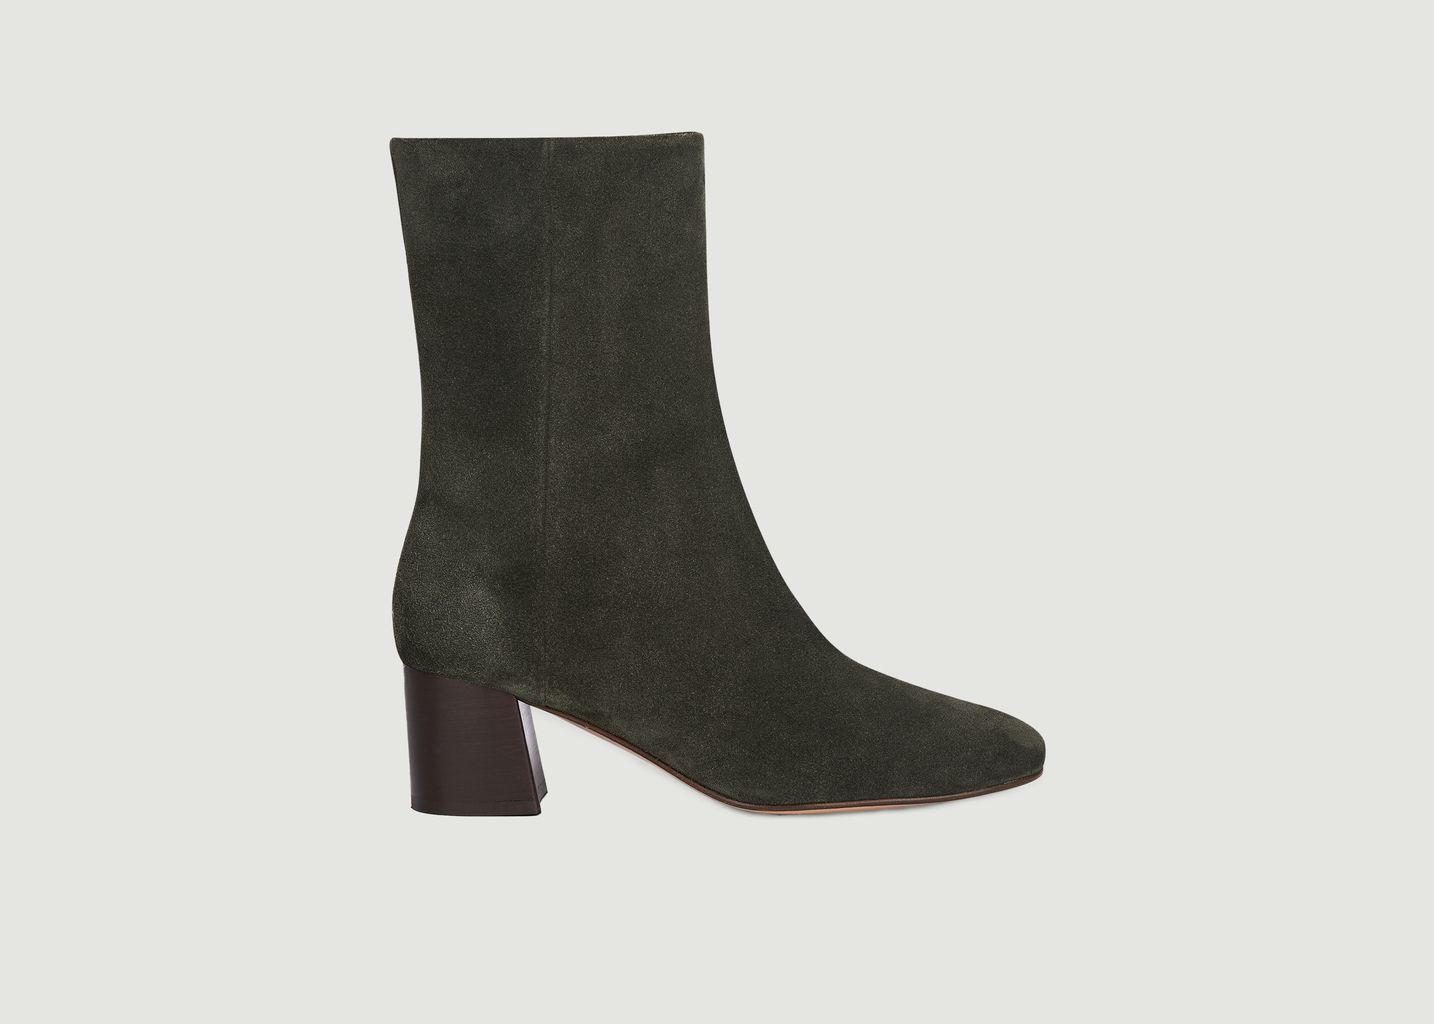 Boots Dunia  - Anthology Paris